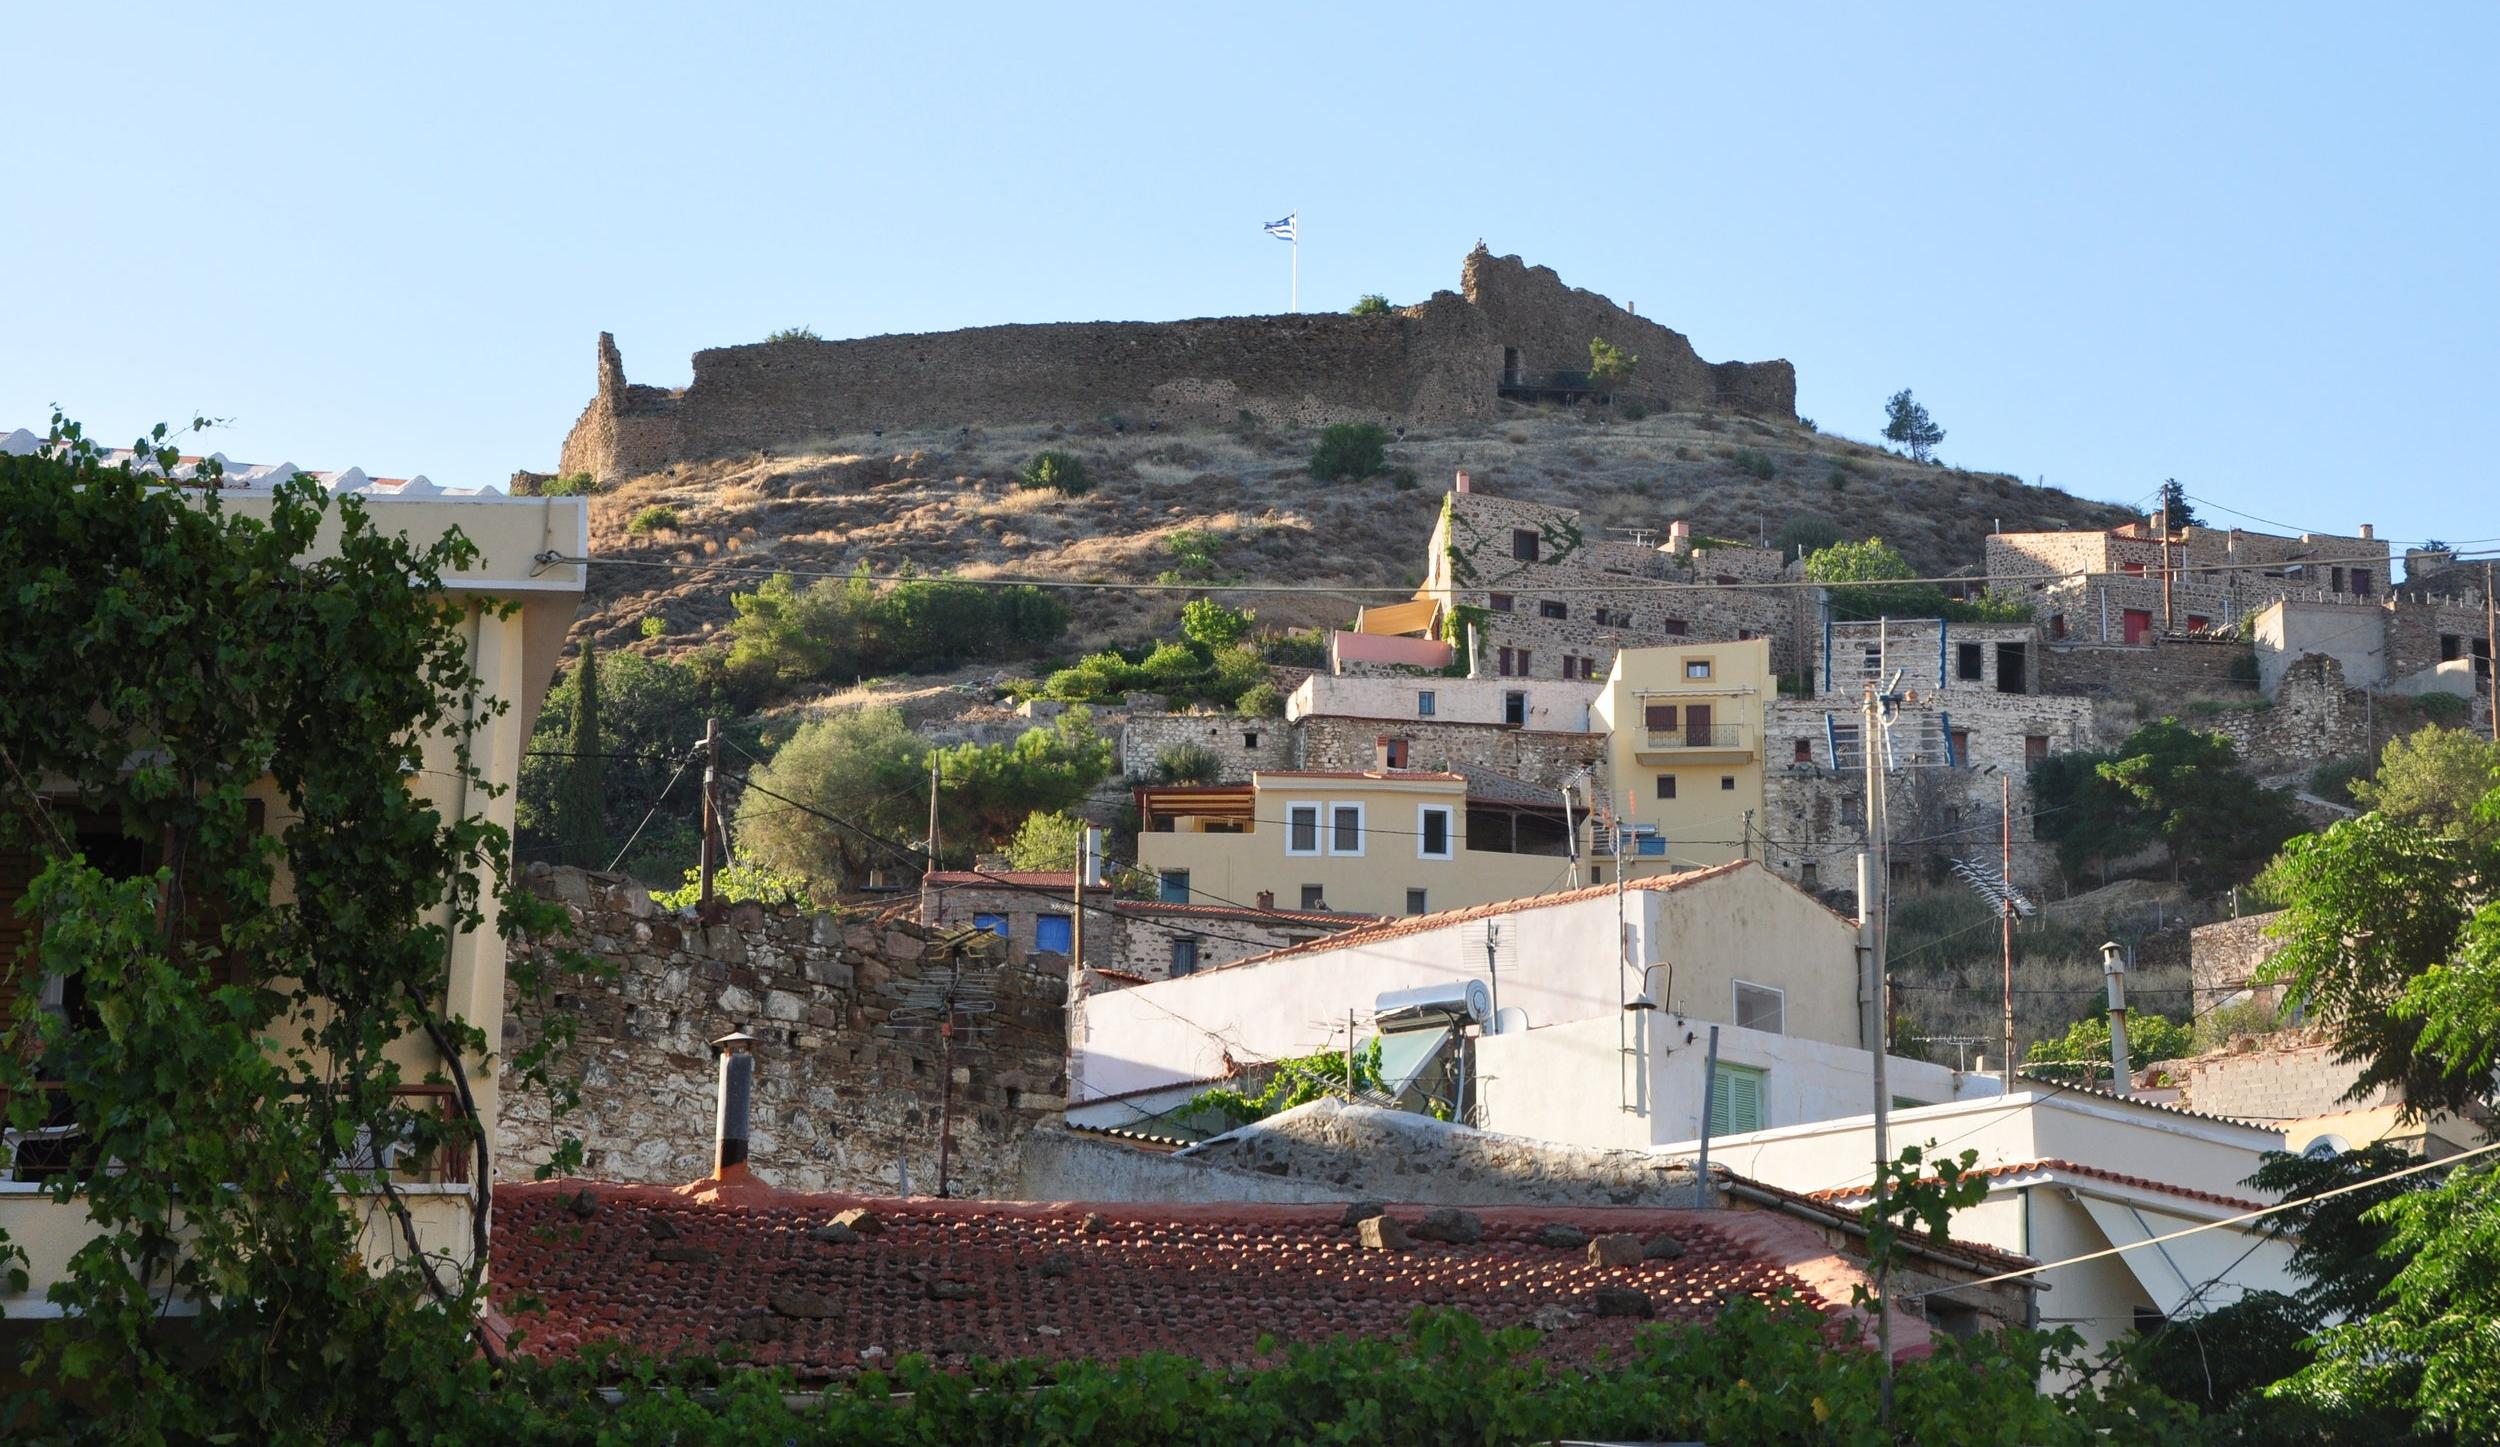 The castle at Volisos